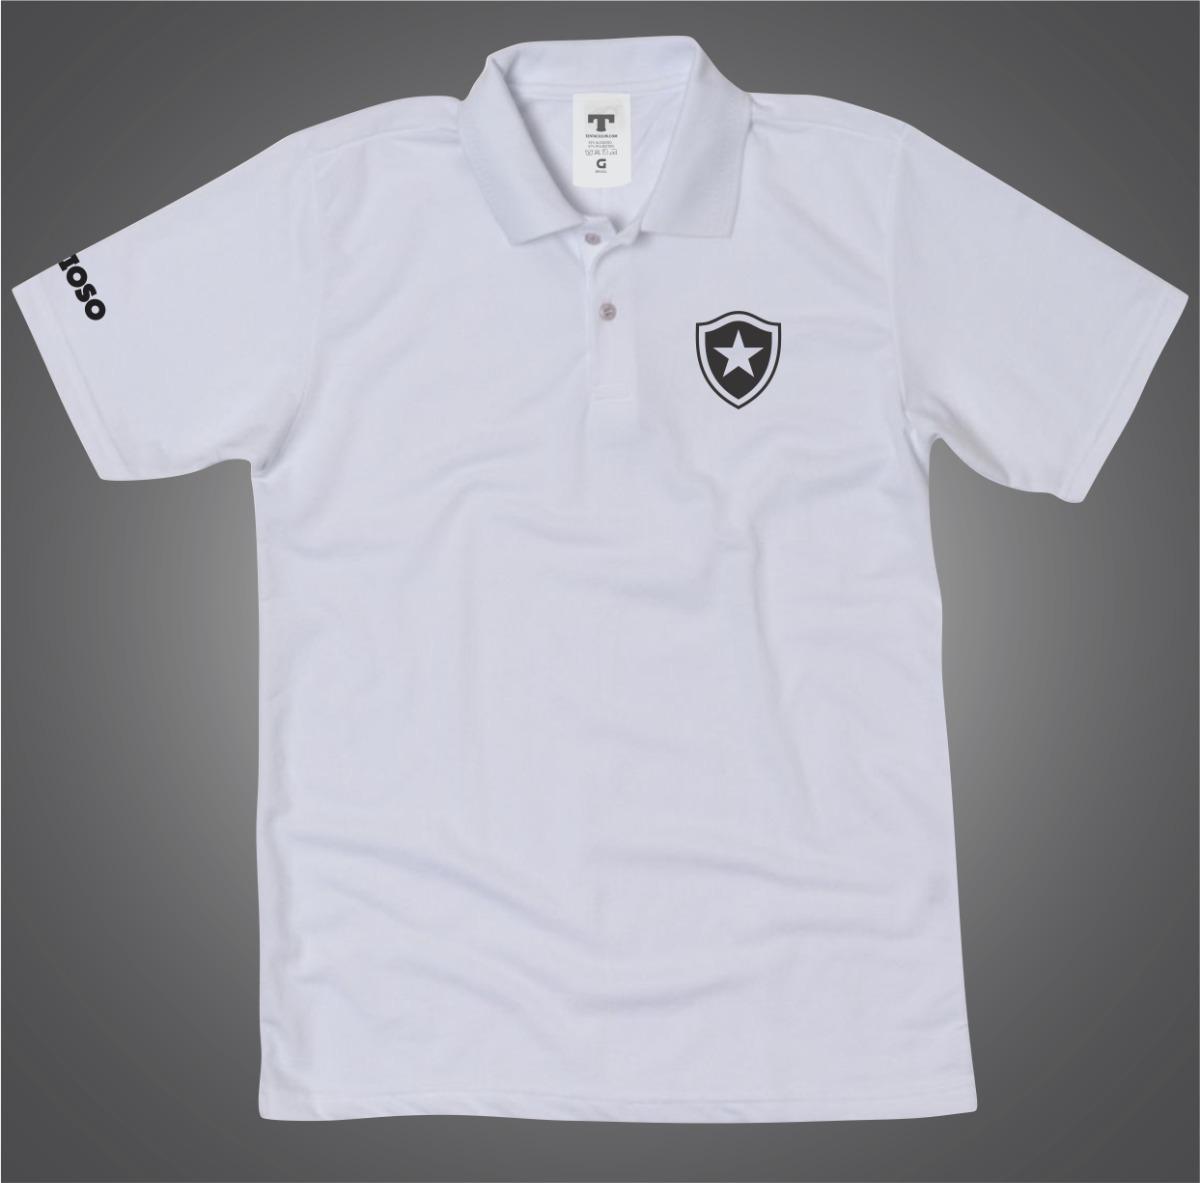 camisa botafogo preta polo torcedor alvinegro masculina. Carregando zoom. 247c03829f19f